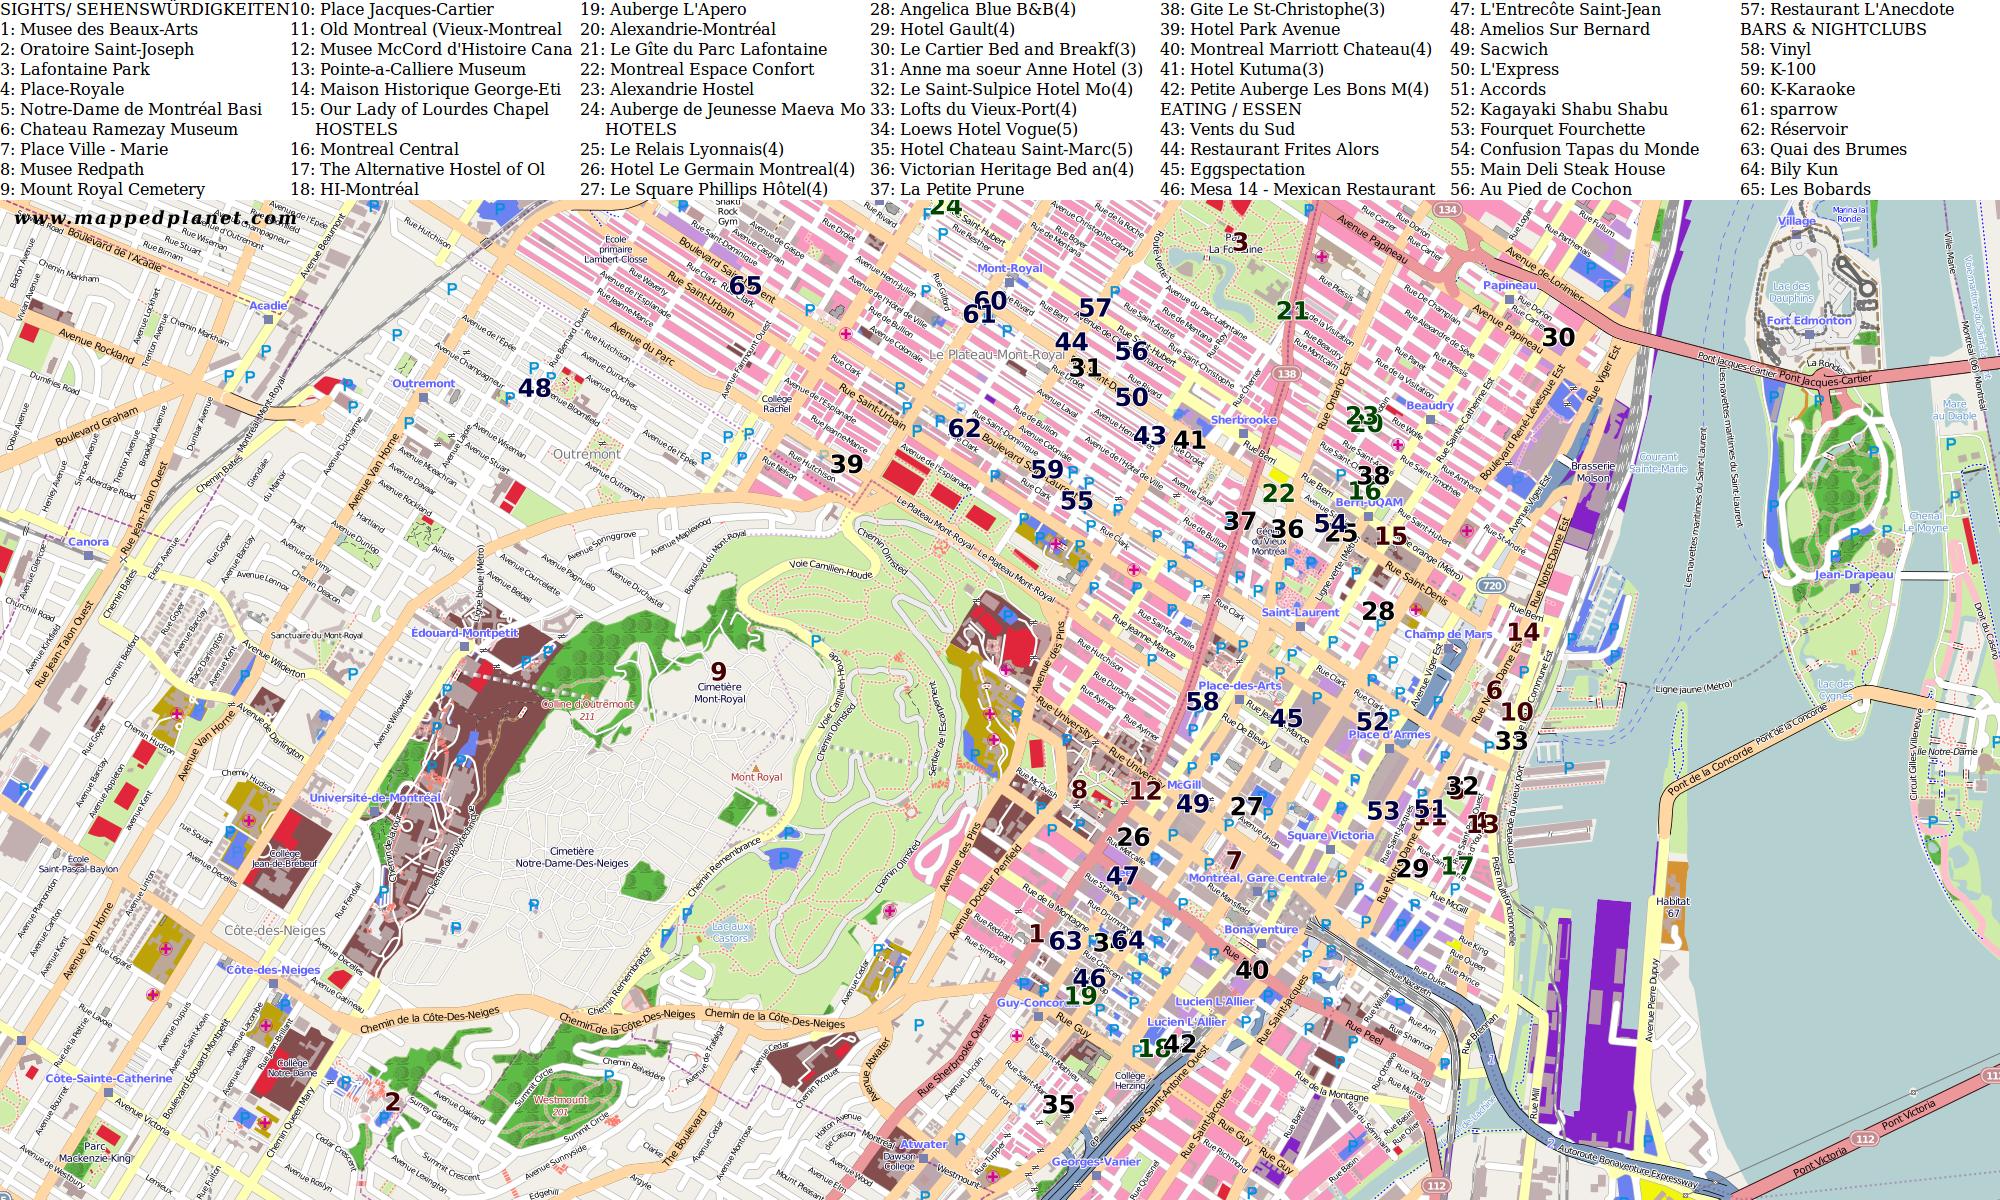 Downtown Tourist Map Montreal Tourism Pinterest Tourist map